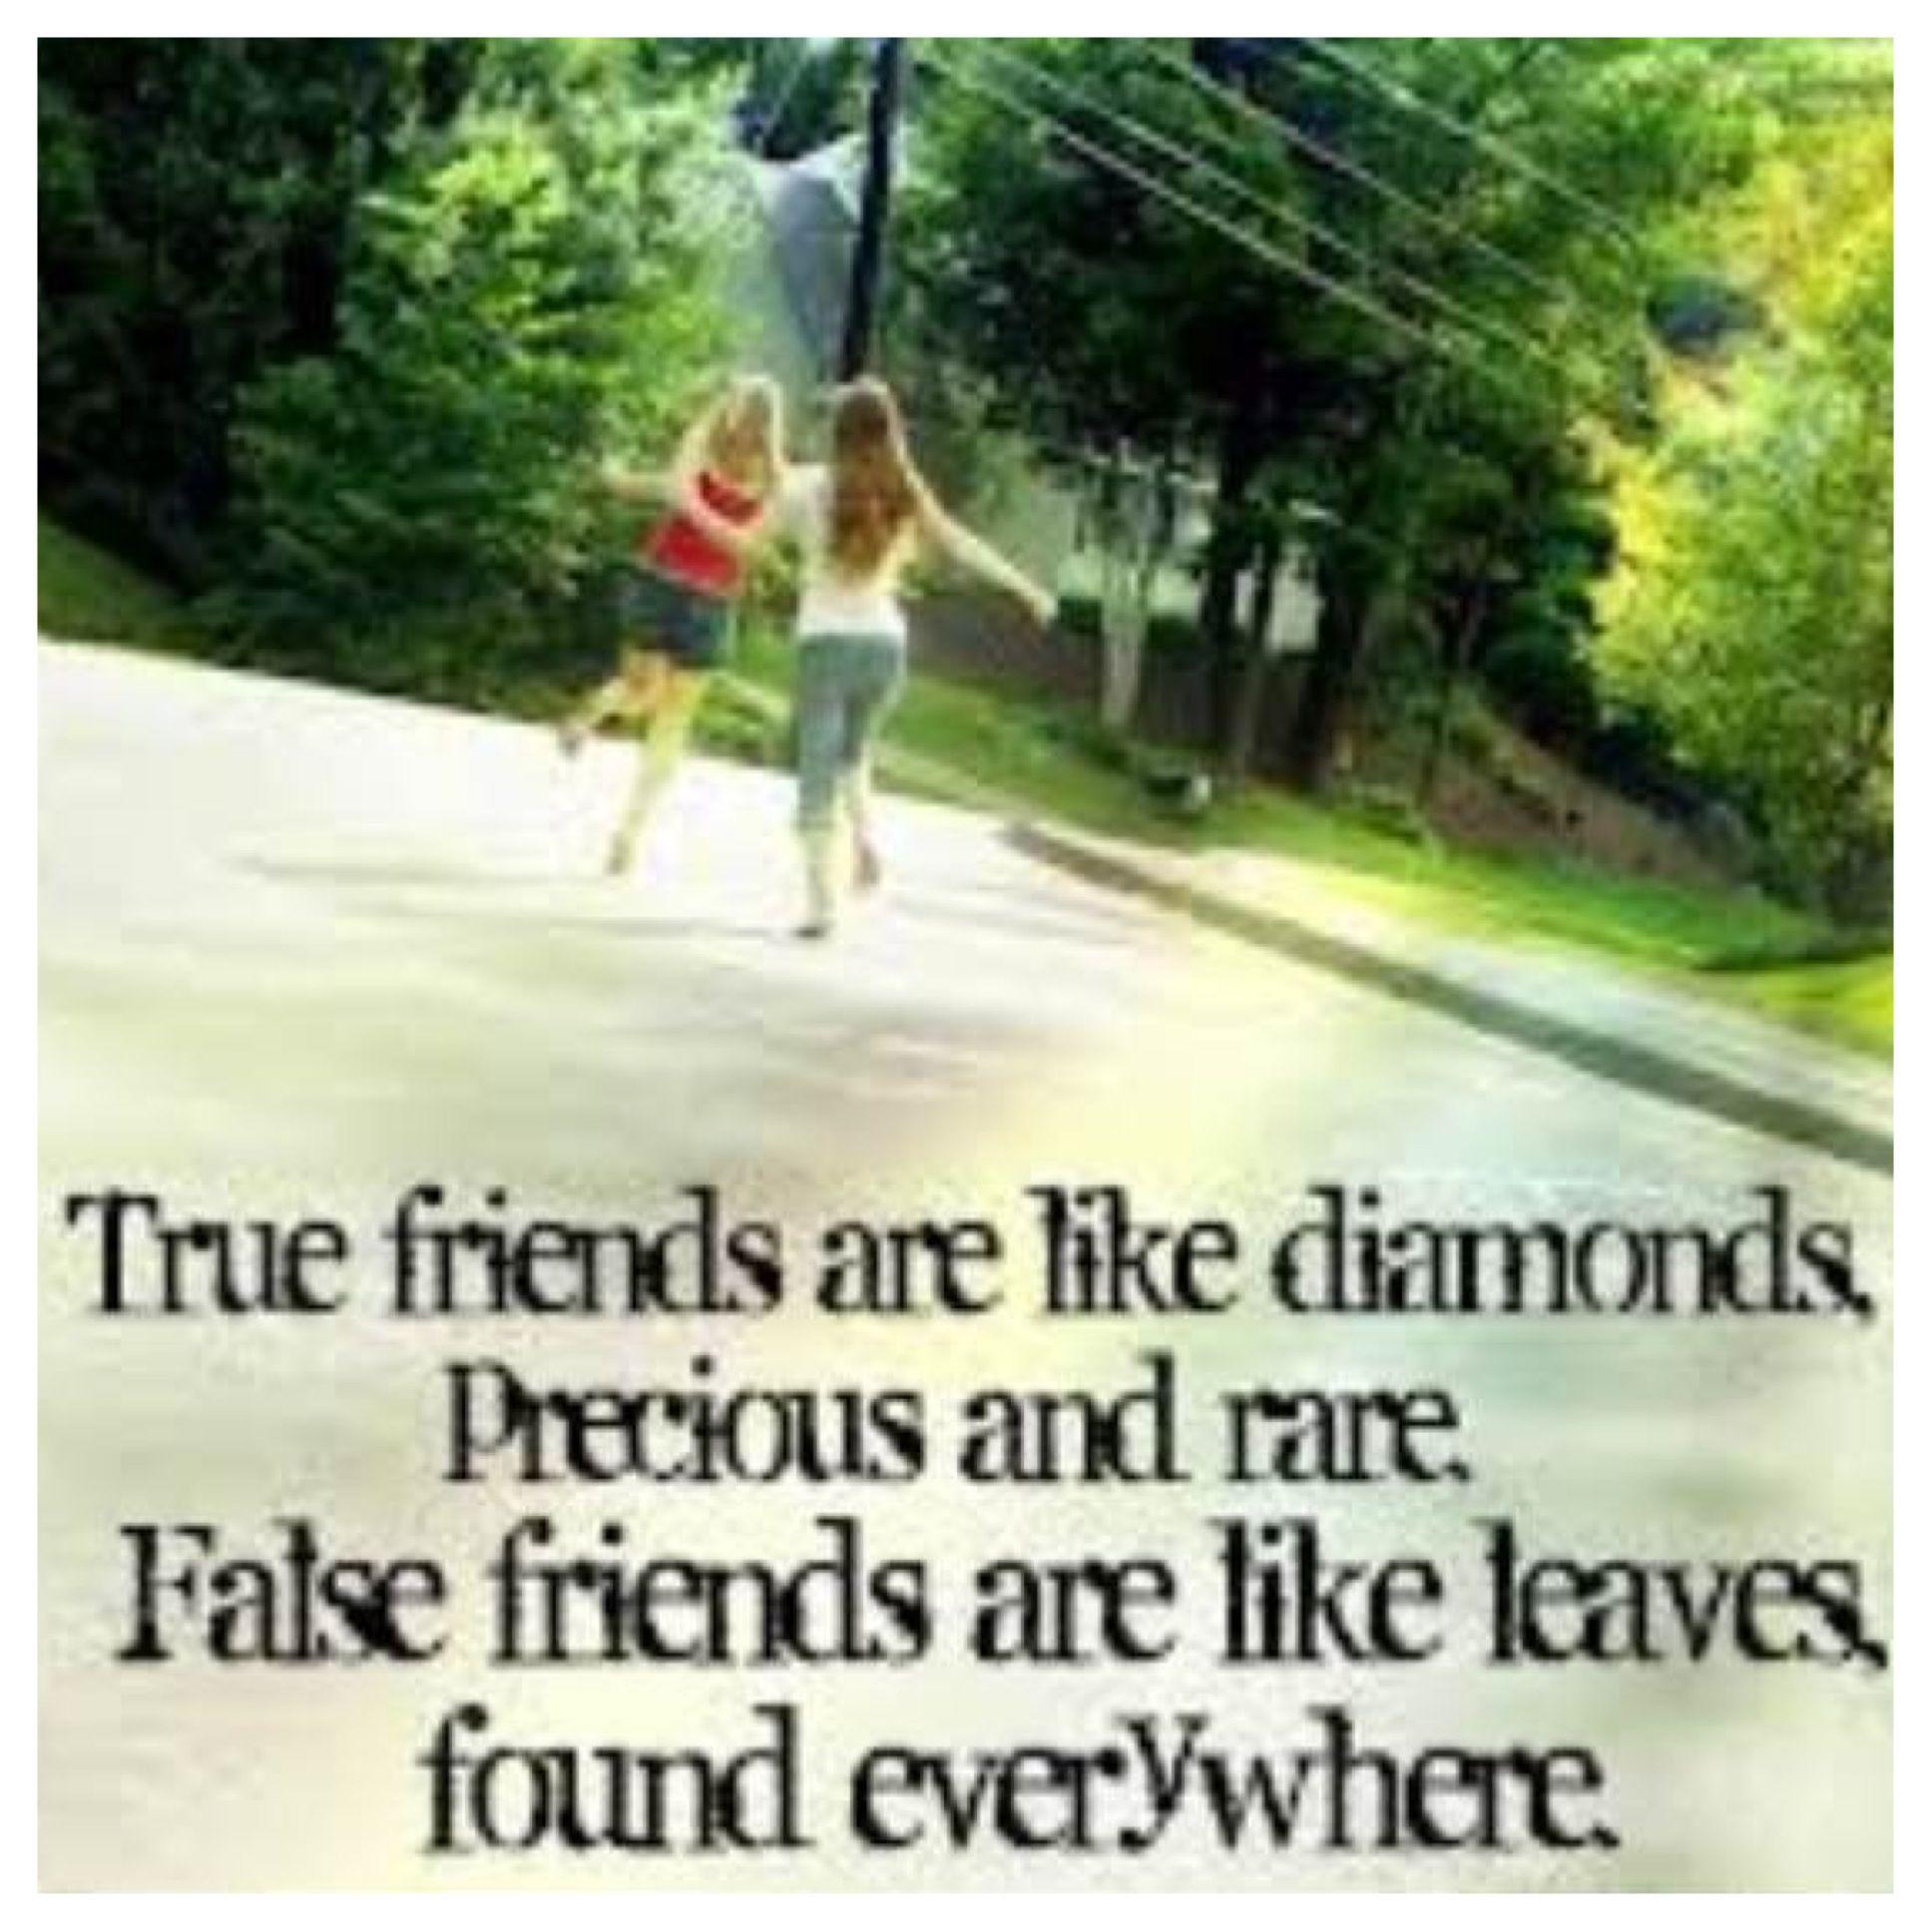 So True Choose Your Friends Wisely True Friends Quotes True Friends True Friendship Quotes